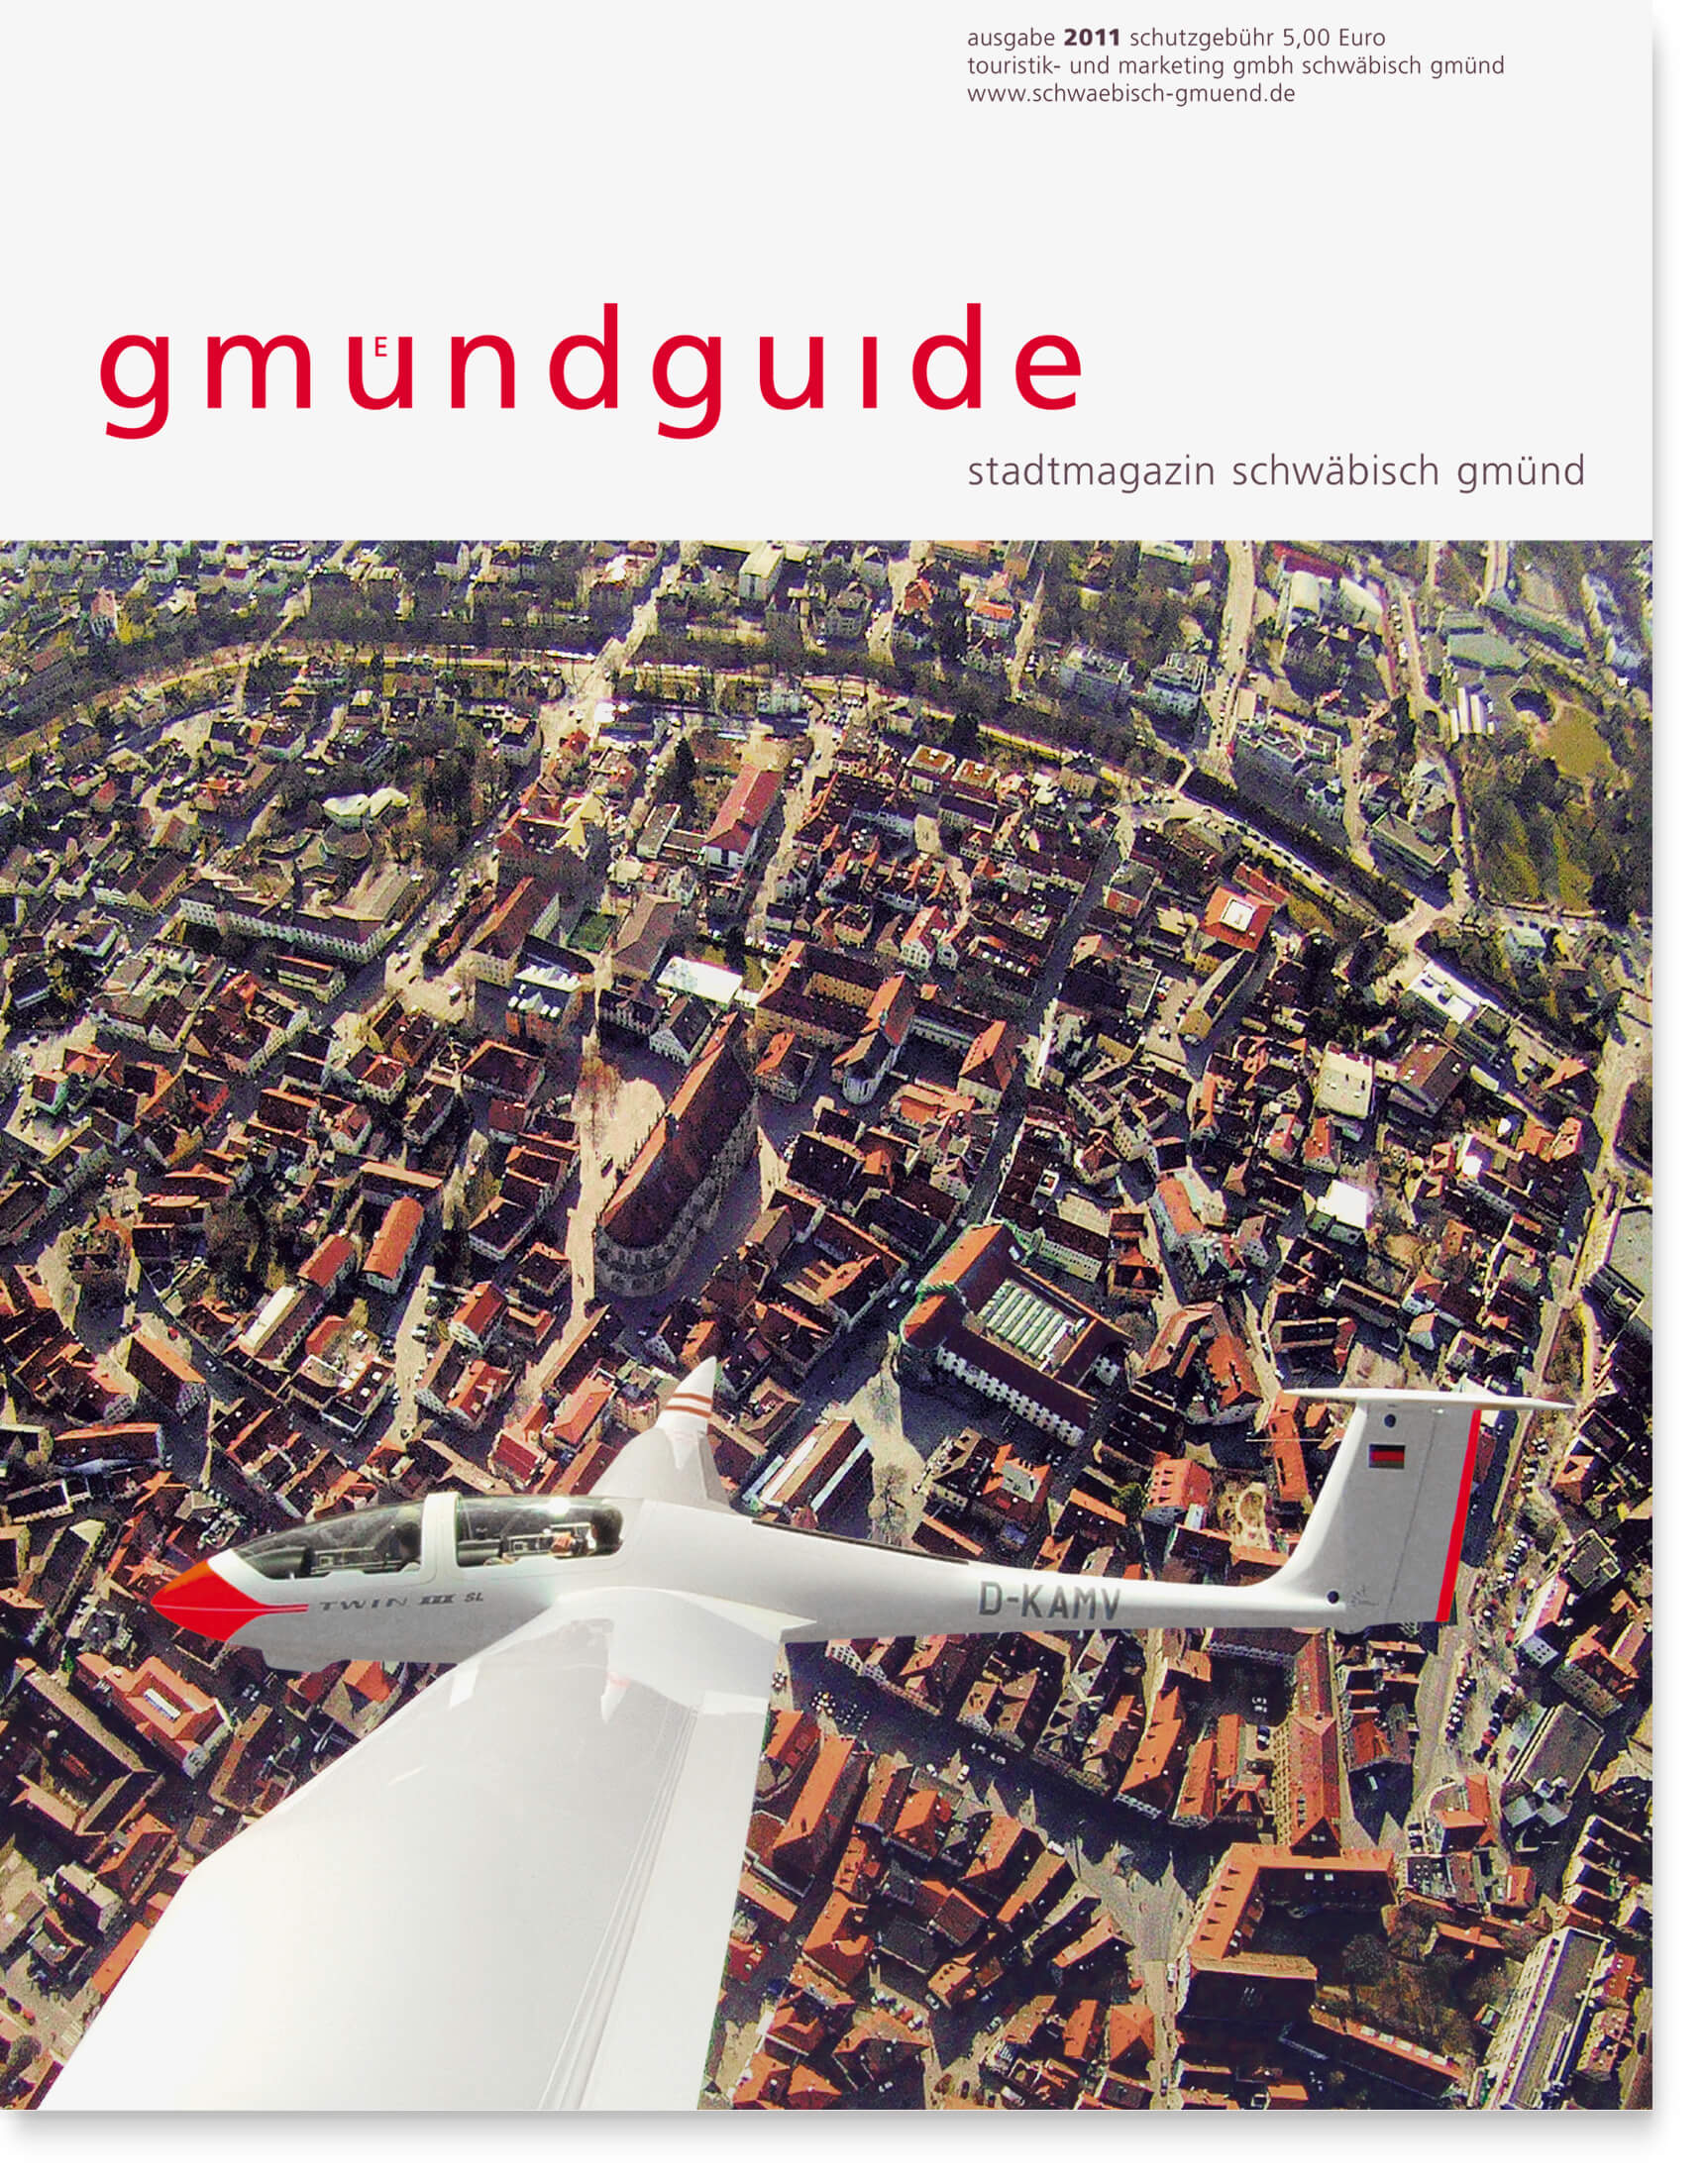 fh-web-gmuendguide-2011-1.jpg